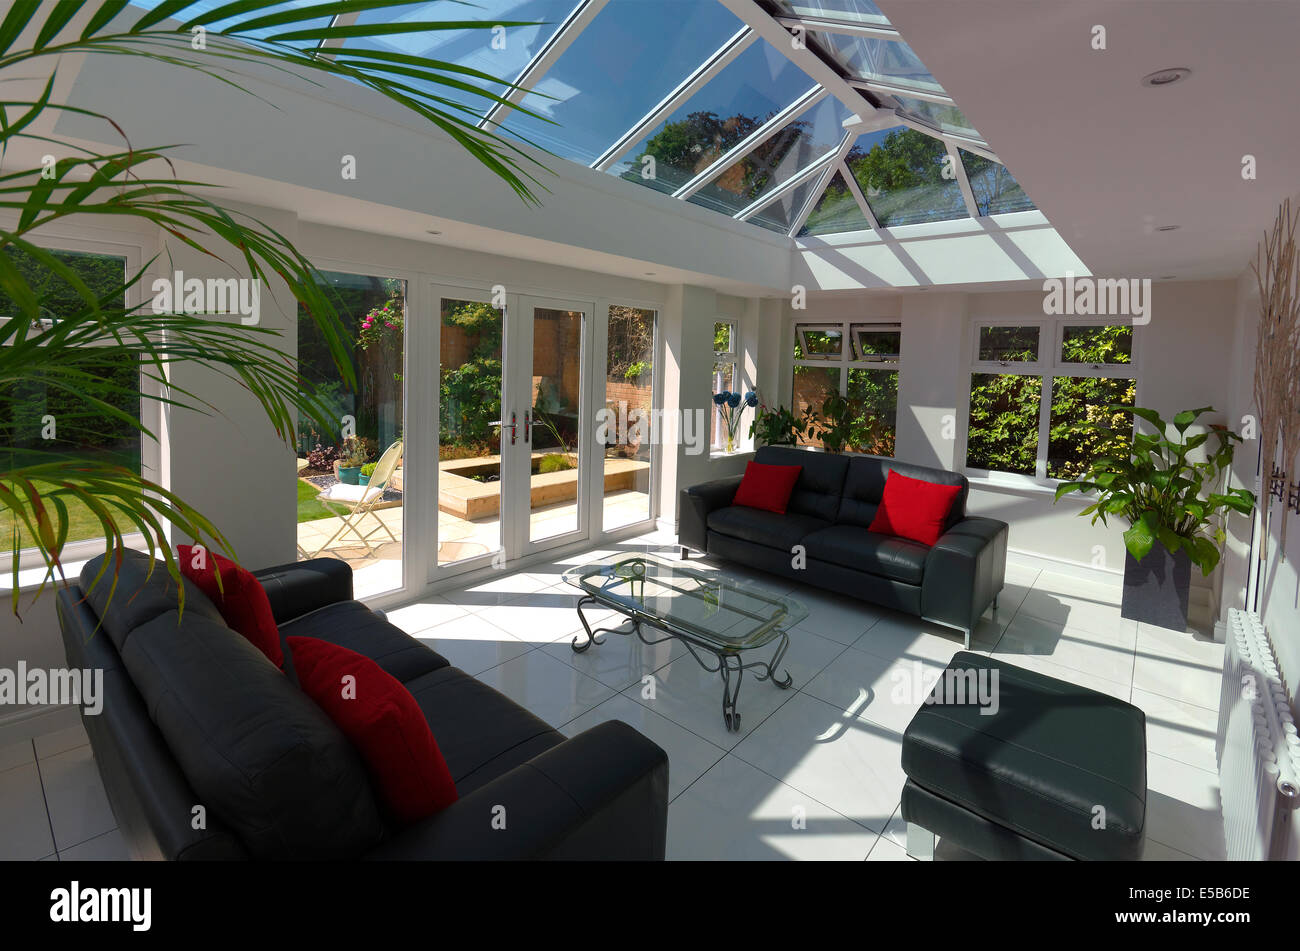 Orangery style conservatory interior home improvement - Stock Image